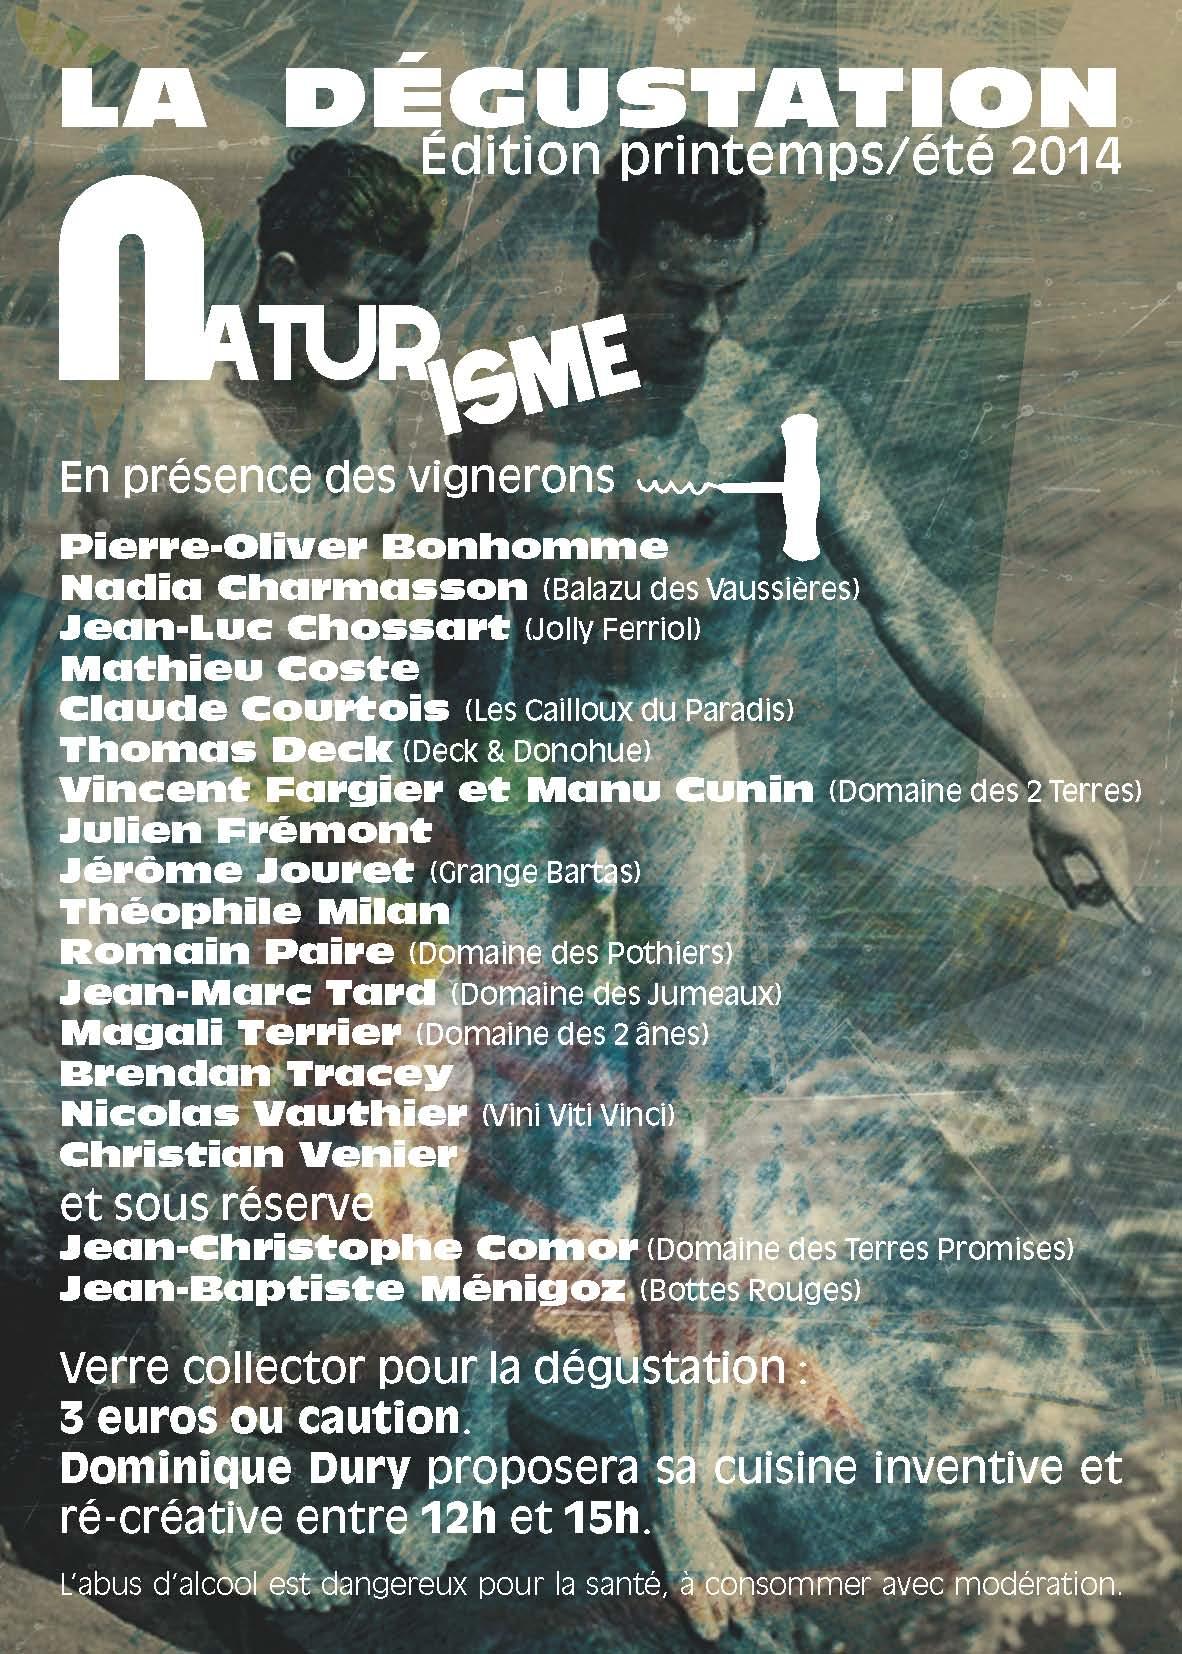 flyers recto verso naturisme juin 14_Page_2 copie